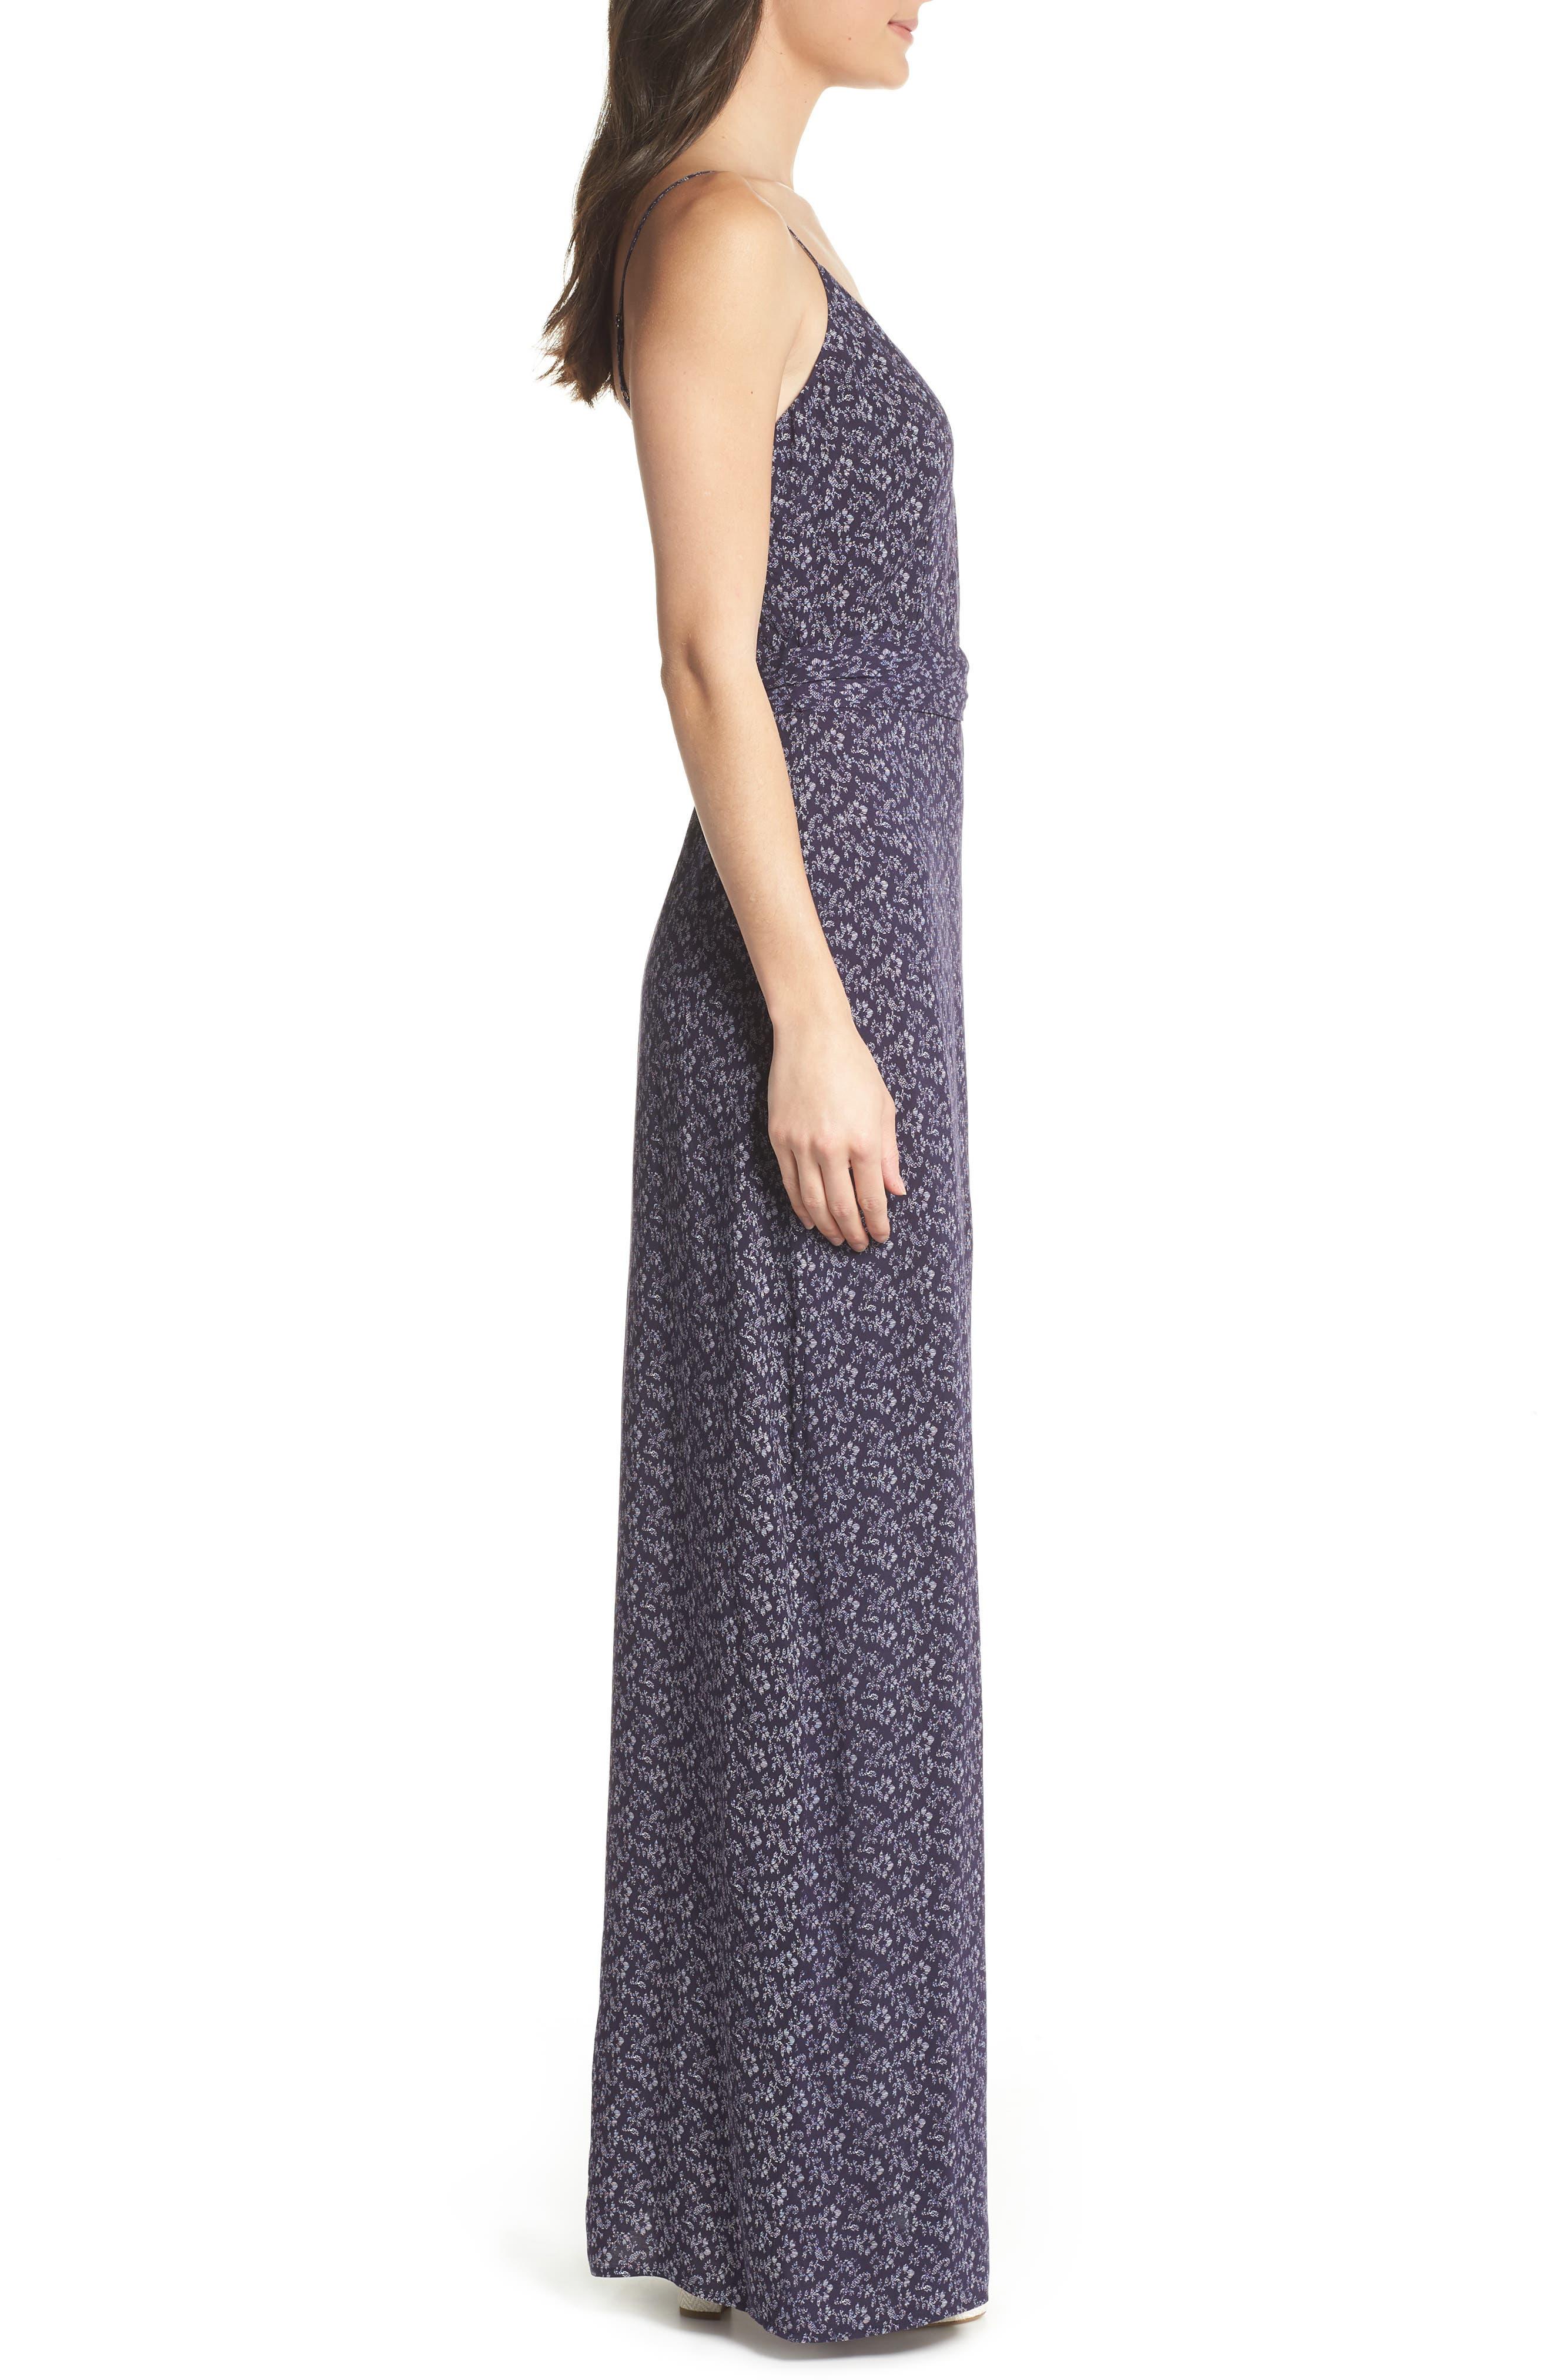 Regina Floral Print Maxi Dress,                             Alternate thumbnail 3, color,                             Parisian Night / Papyrus